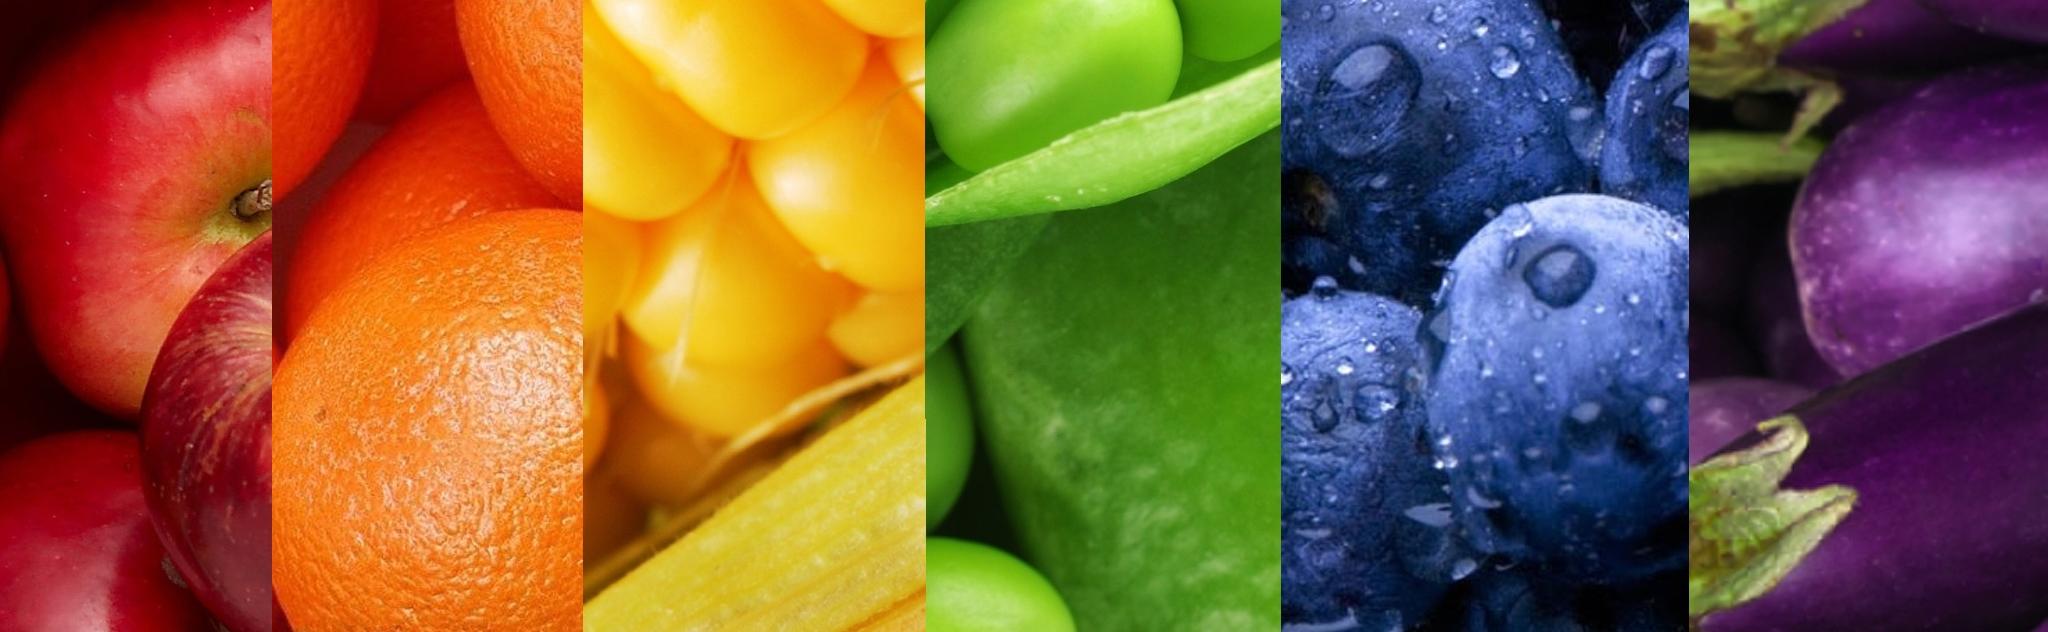 Food_Background2